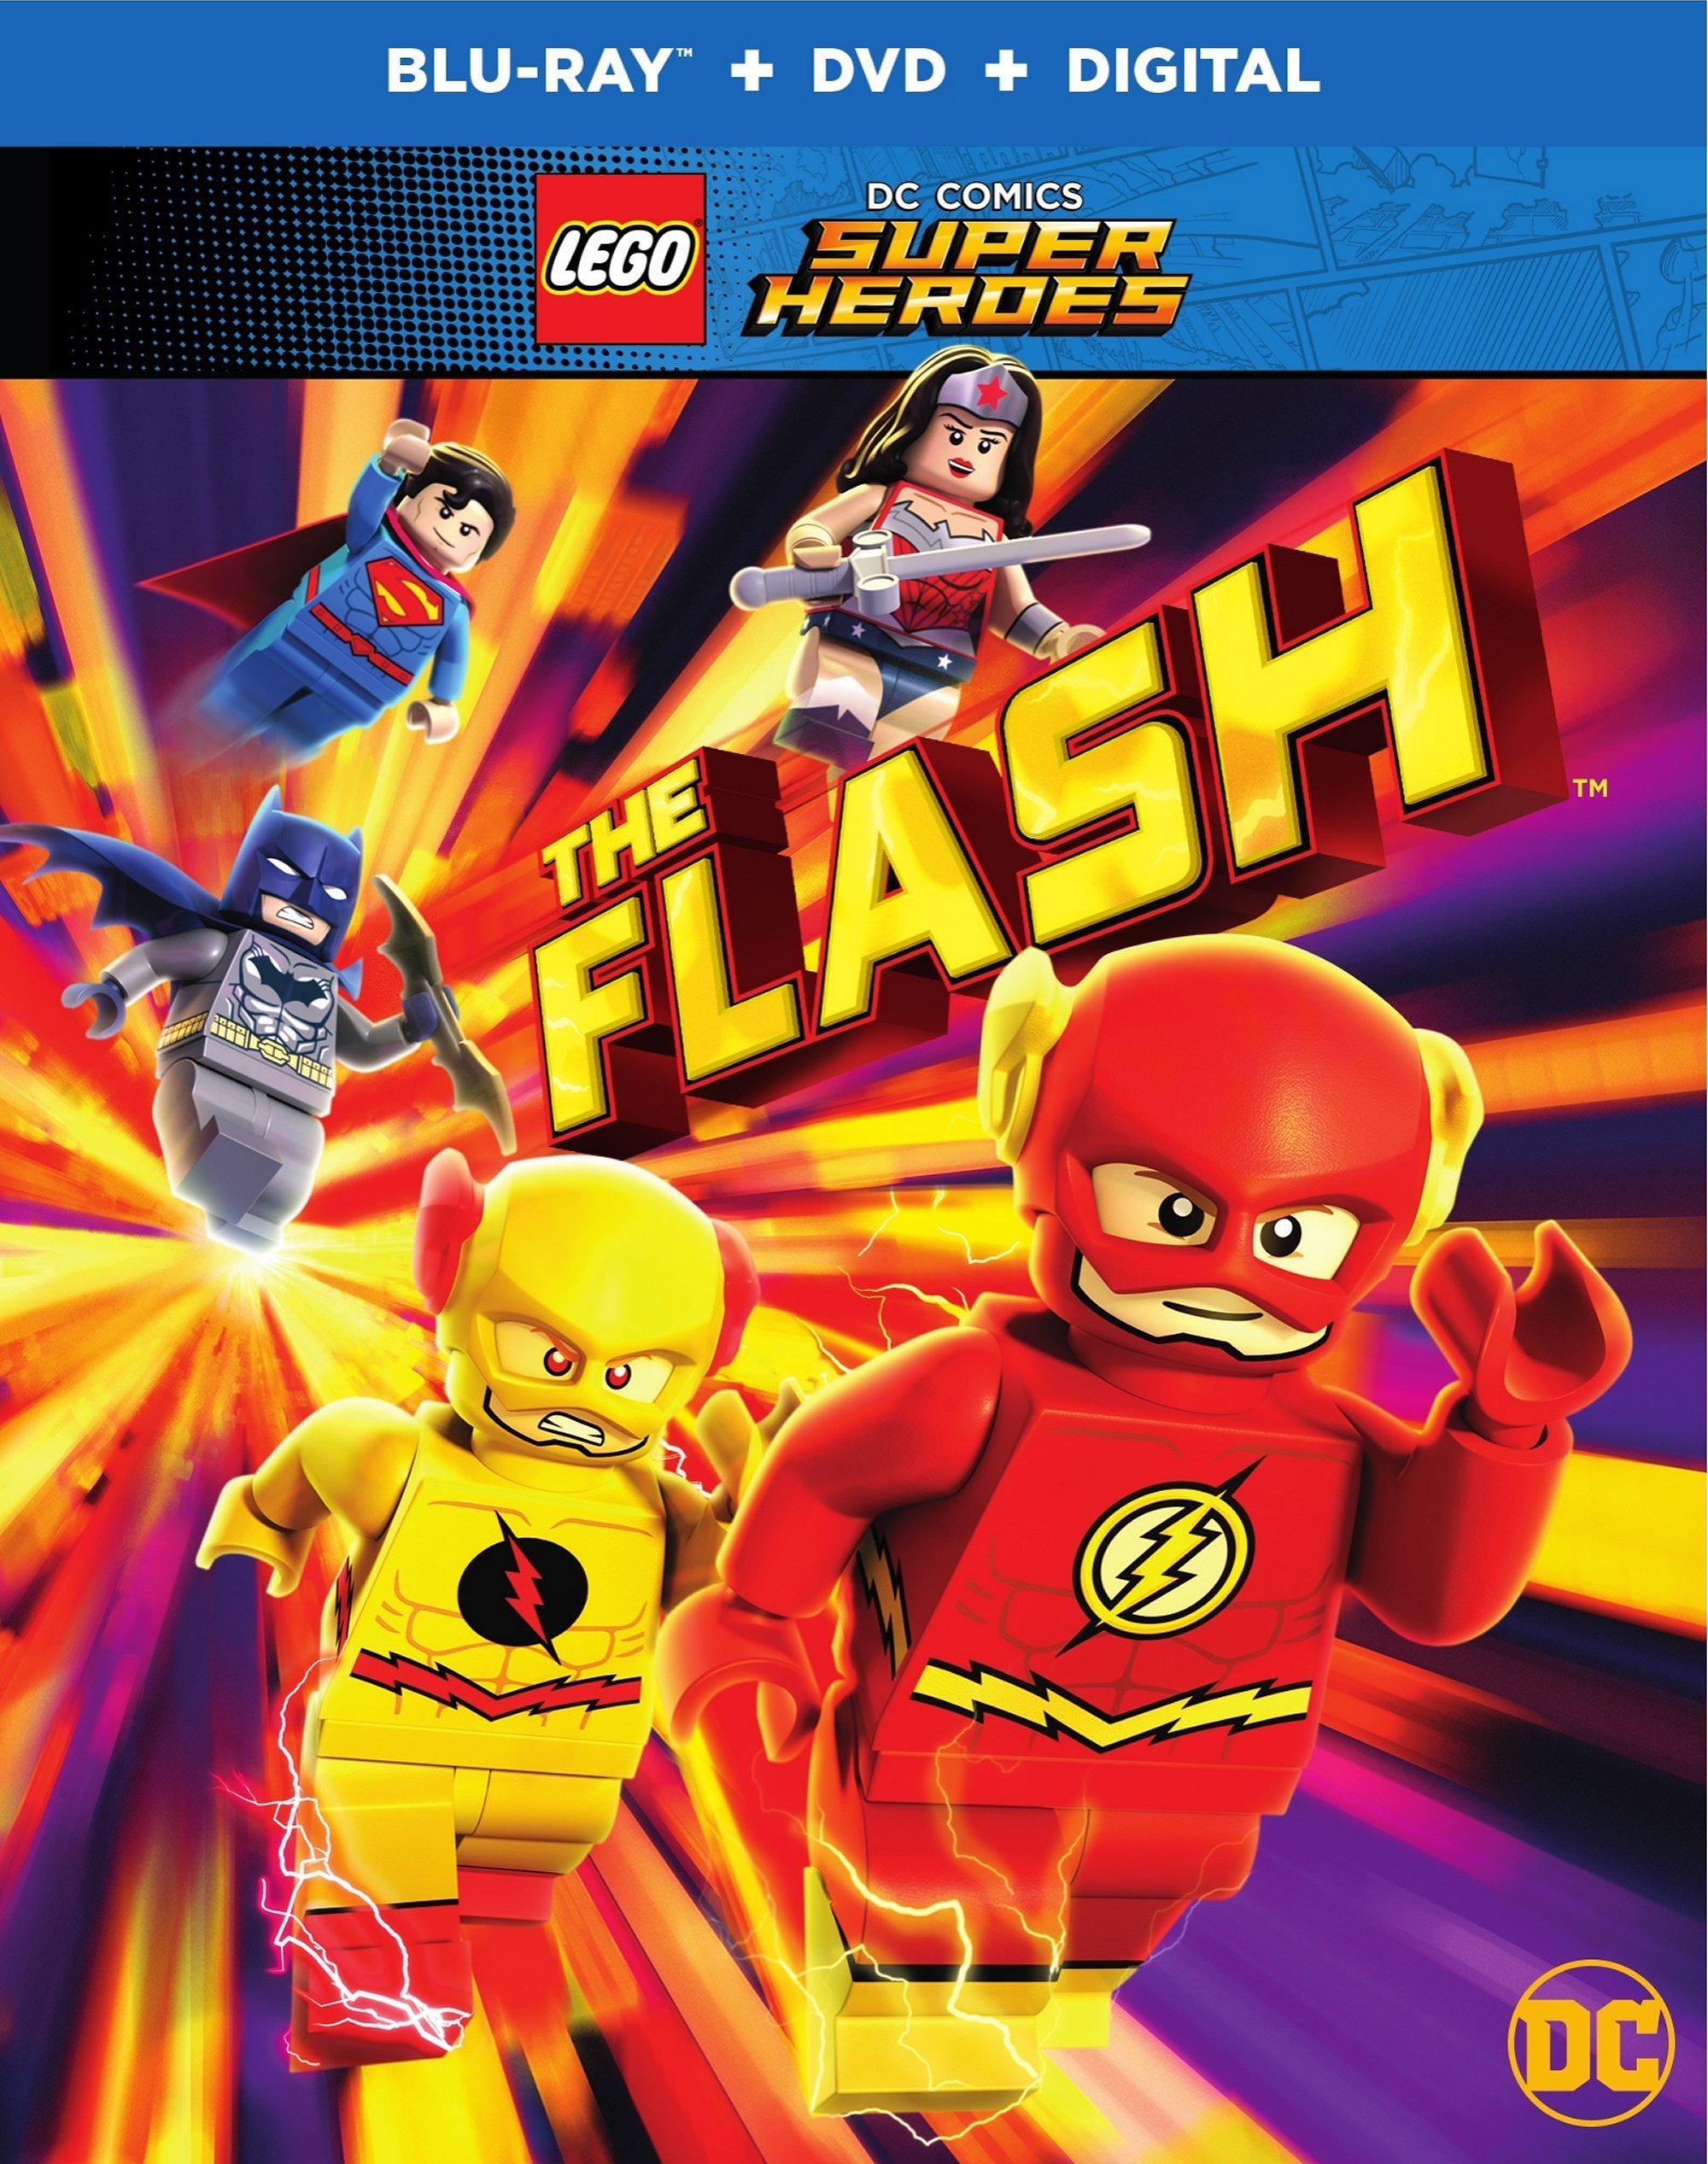 LEGO DC Comics Super Heroes: The Flash (2018) Blu-ray